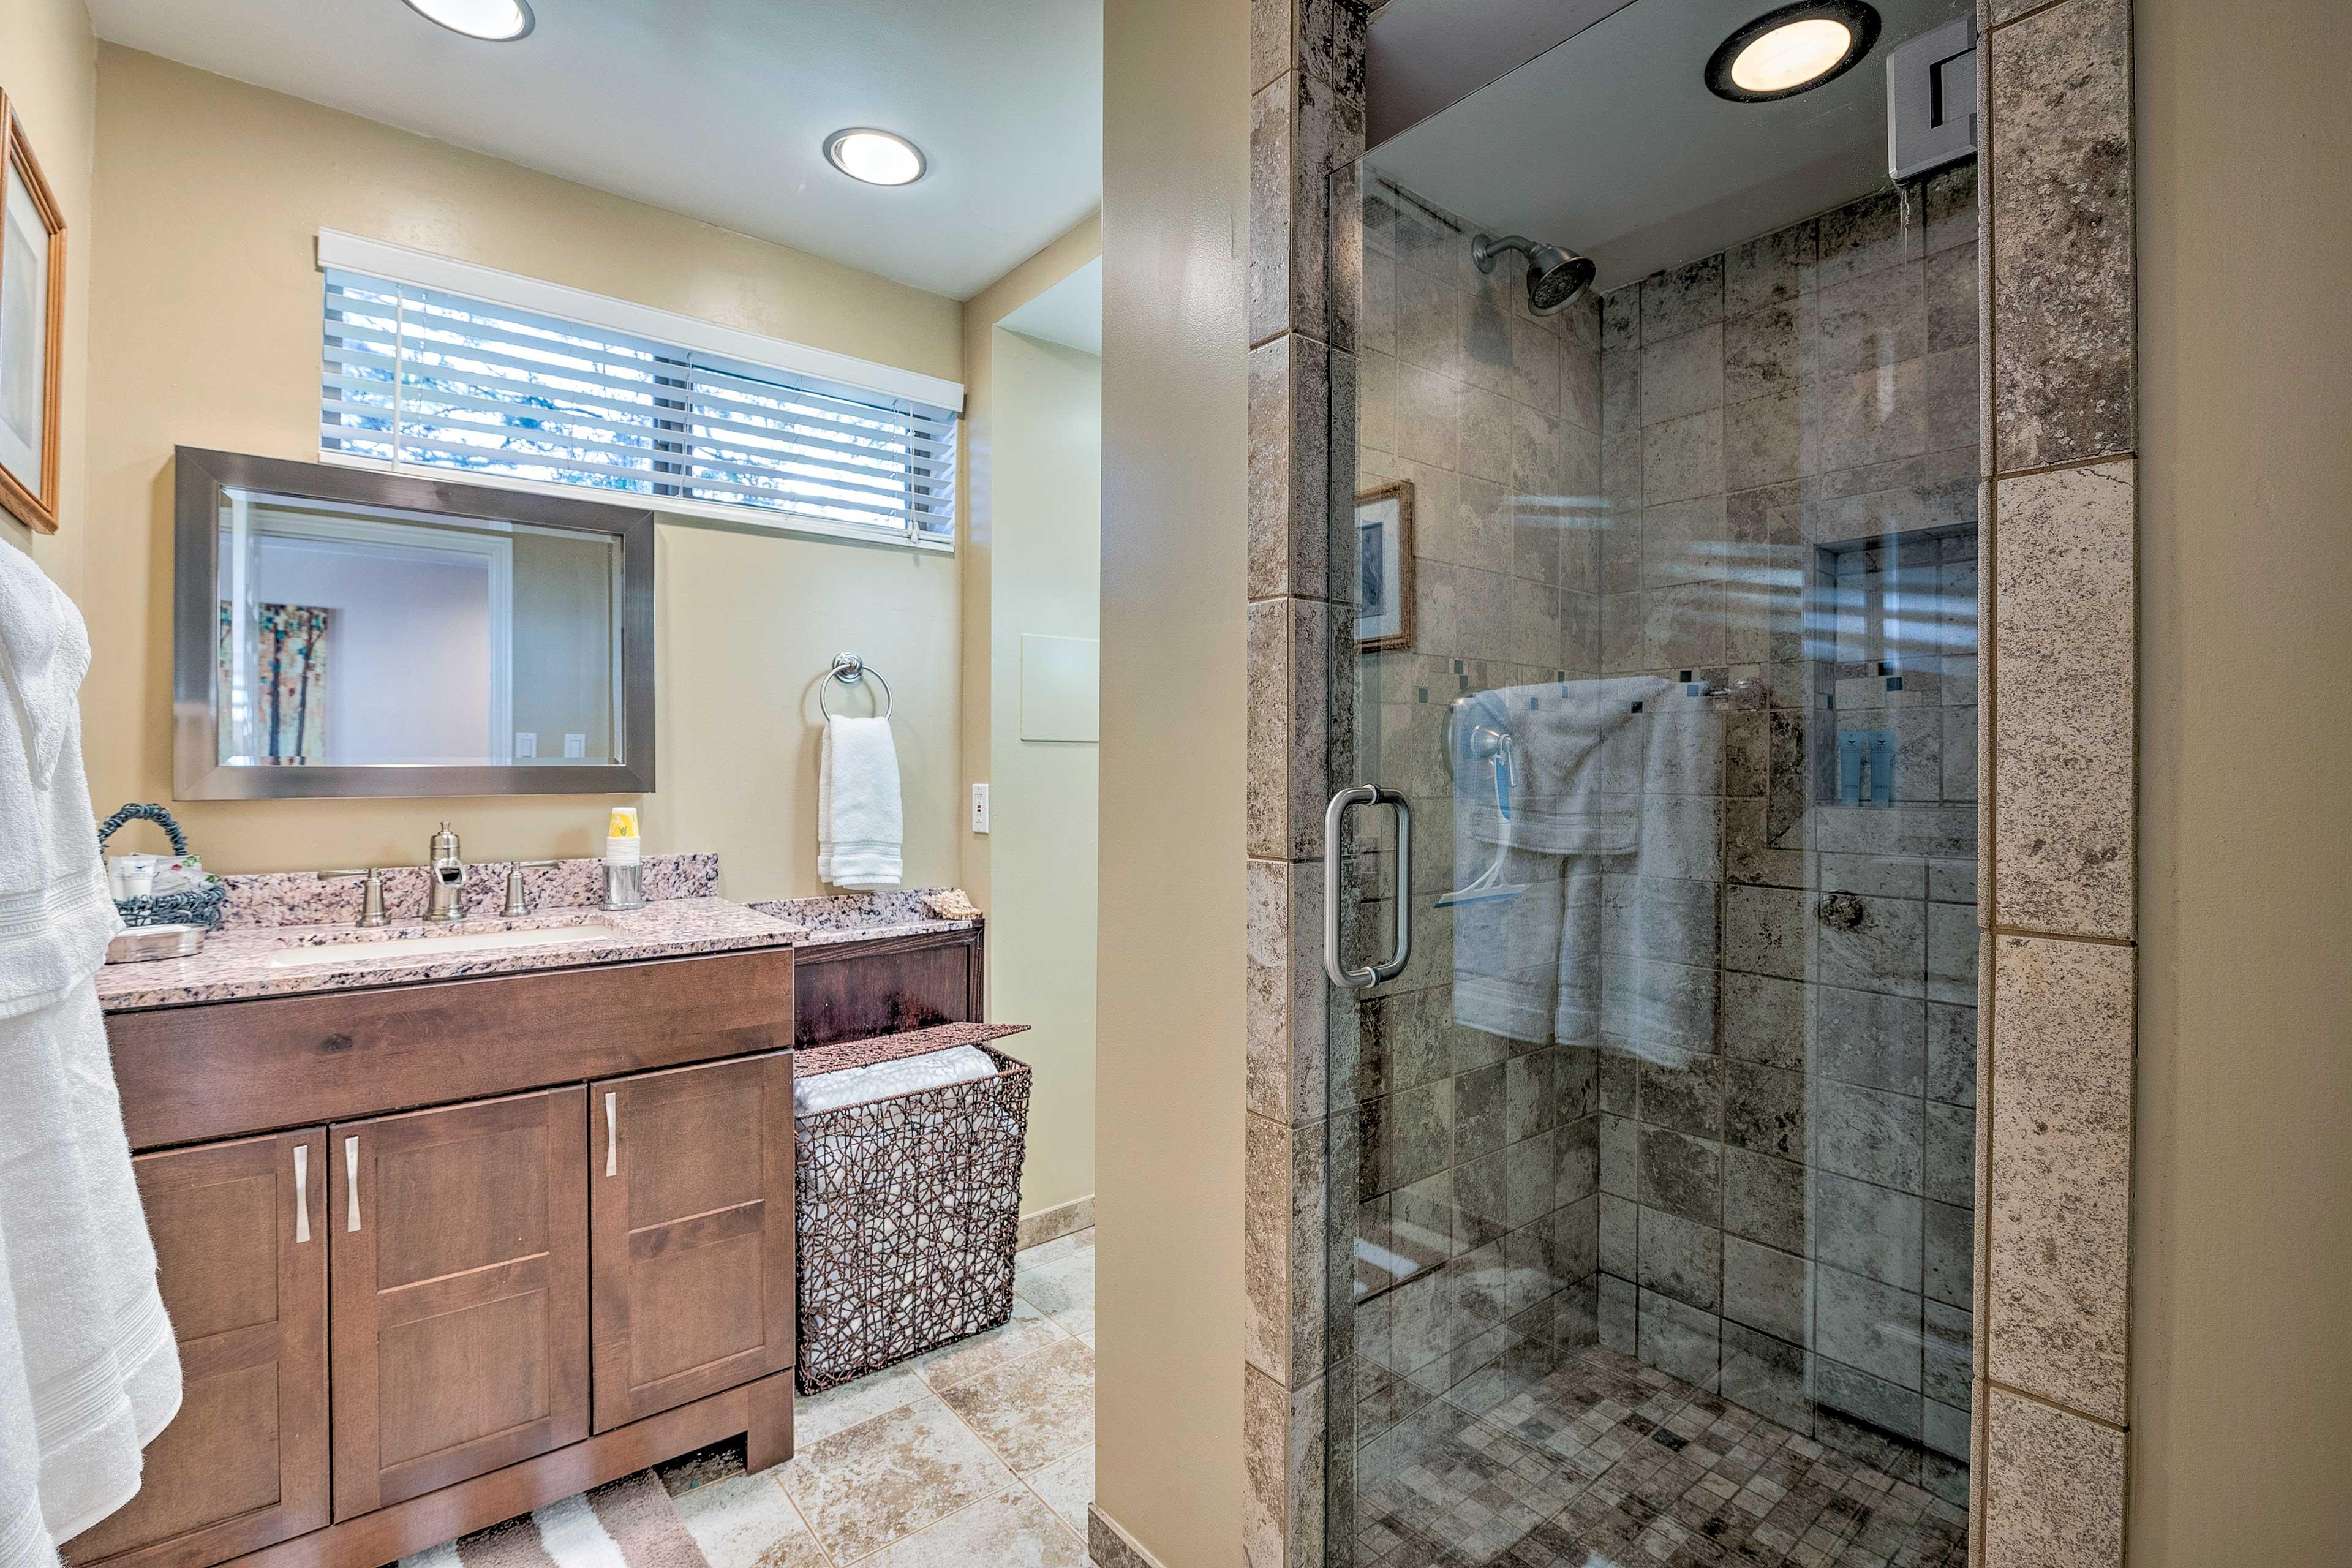 The full bathroom boasts a beautiful, tiled walk-in shower.